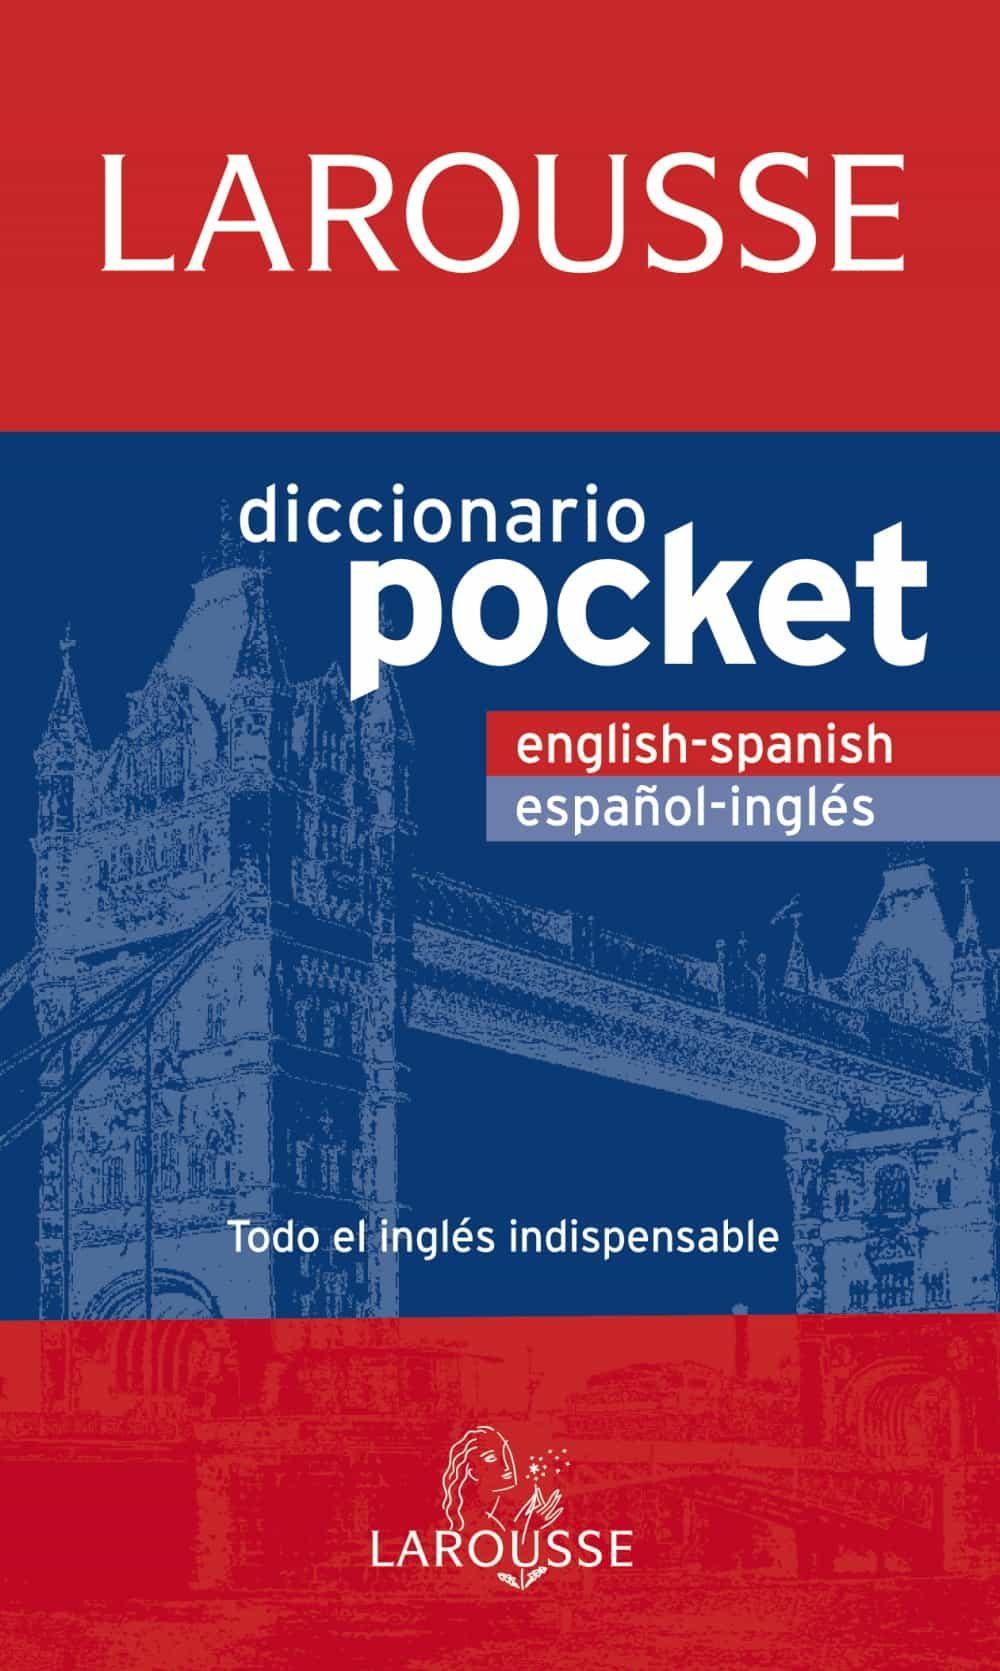 DICCIONARIO POCKET ESPAÑOL-INGLES / ENGLISH-SPANISH | VV